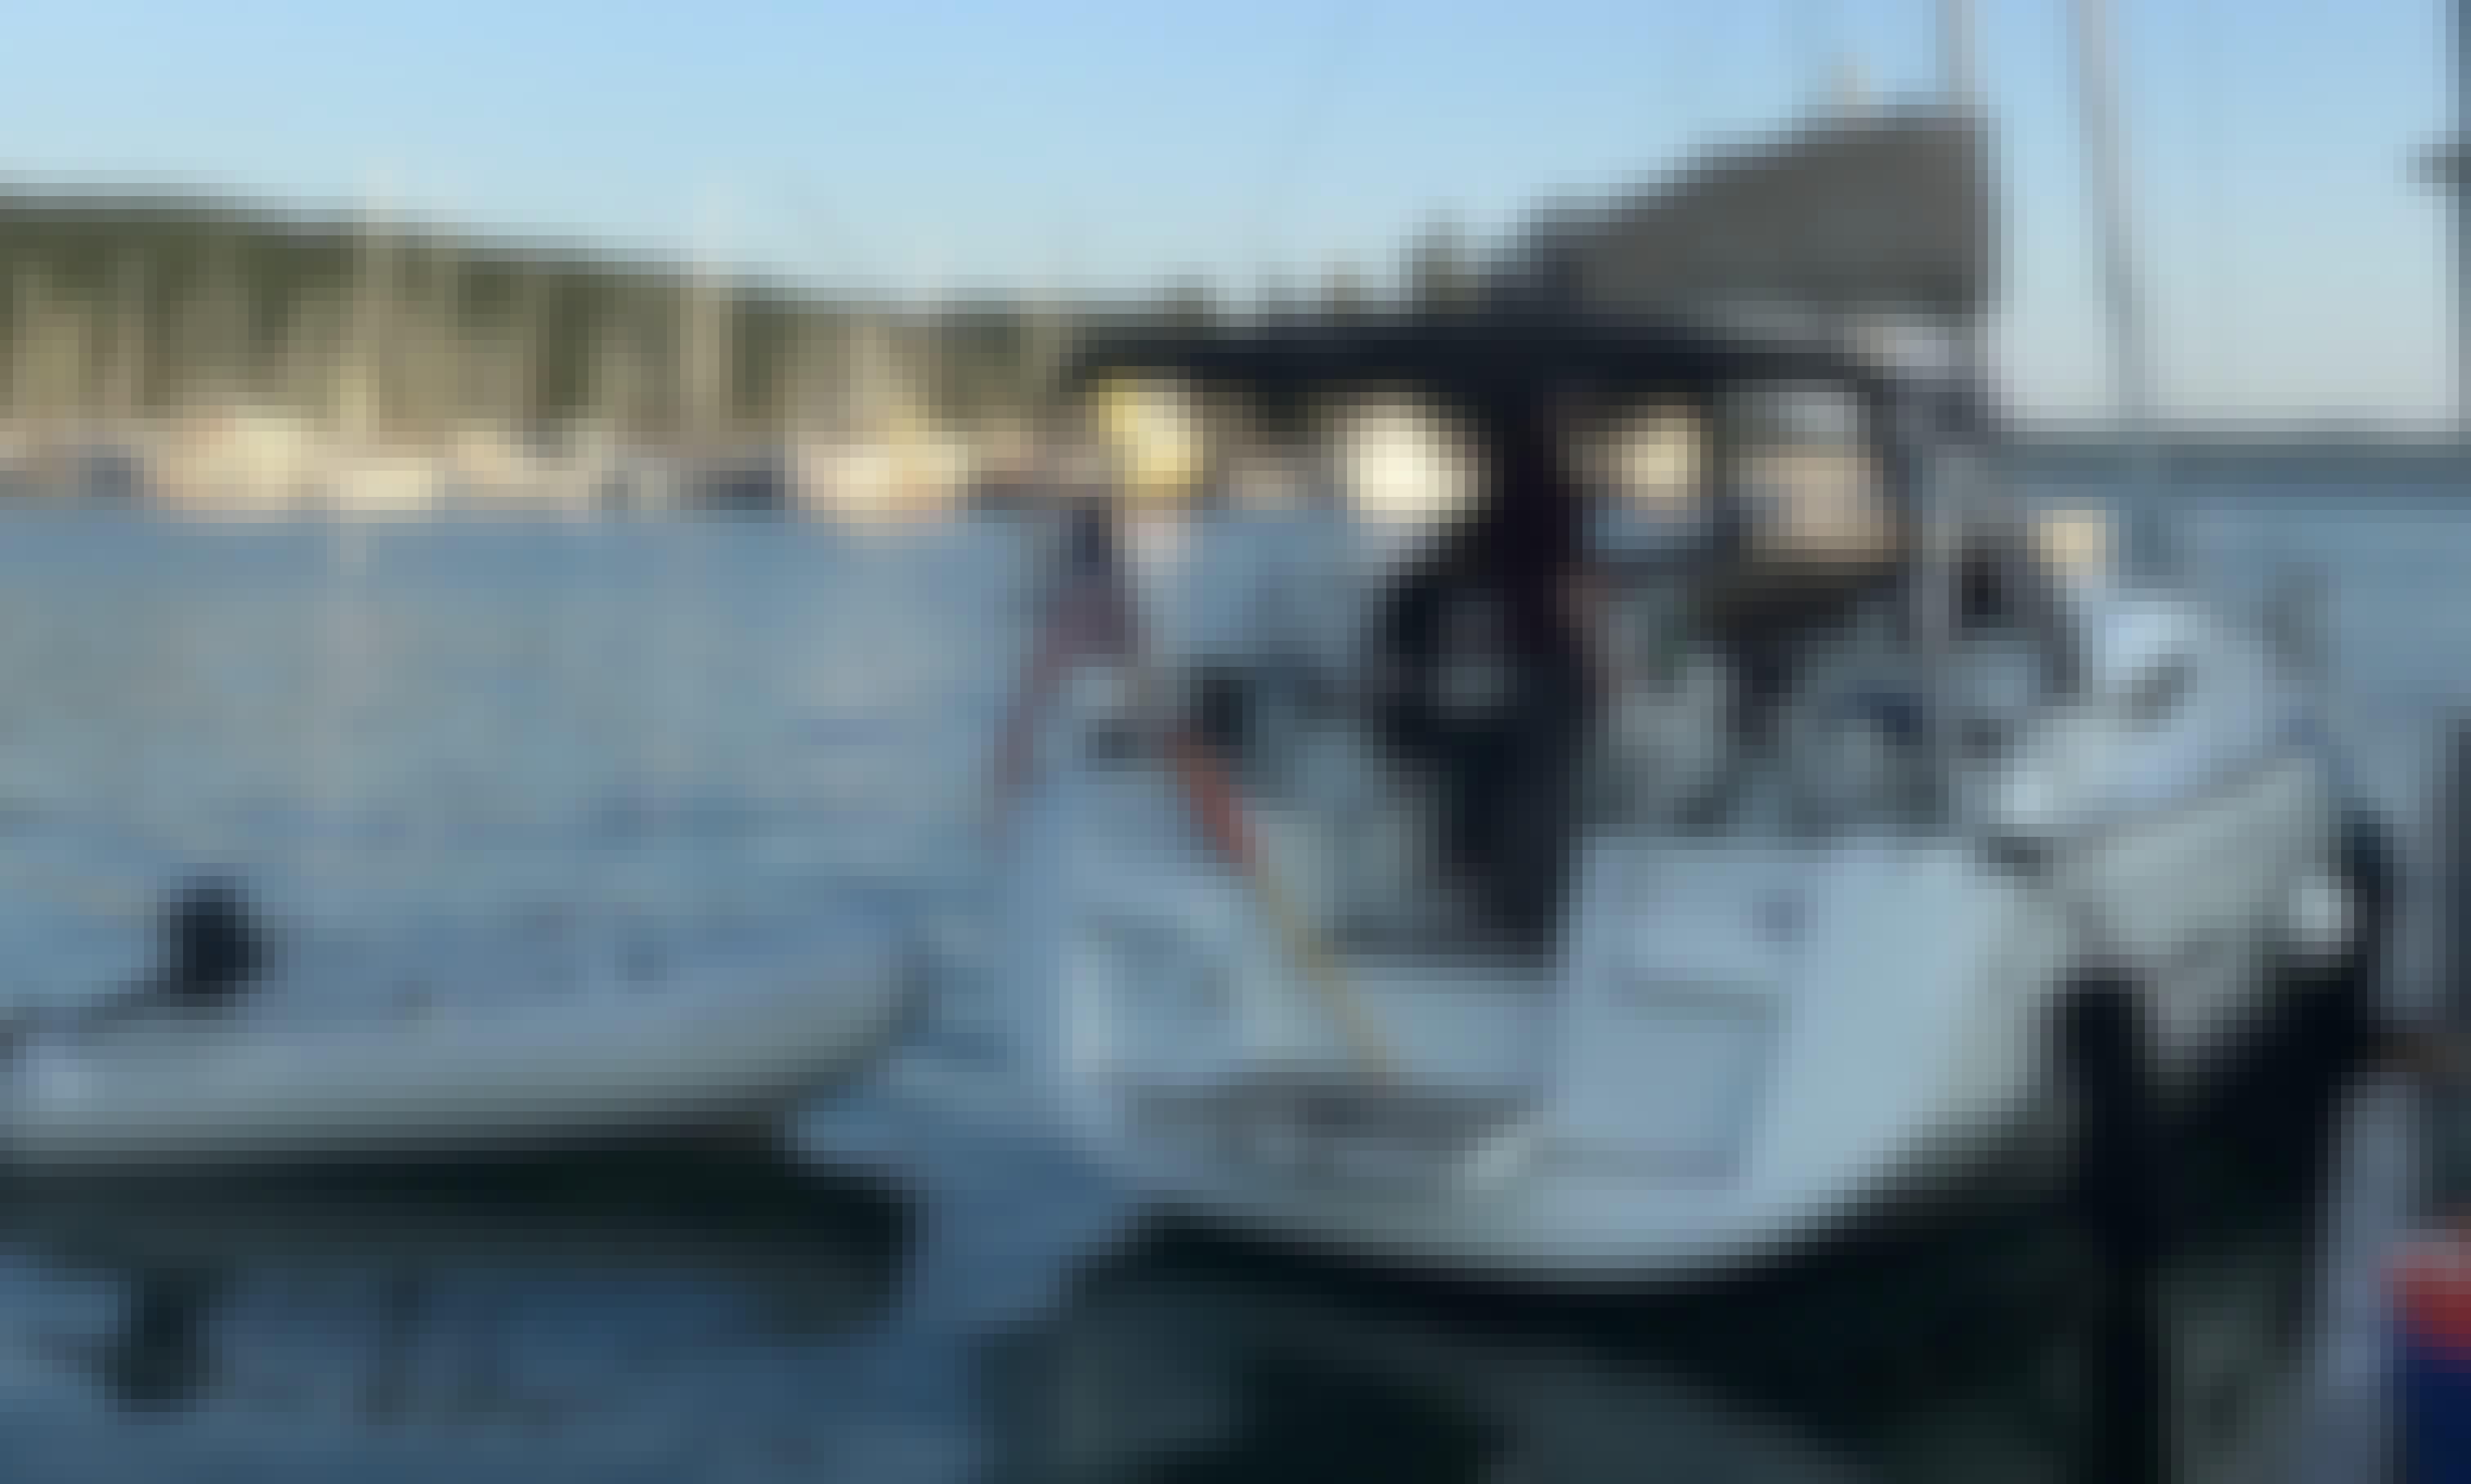 Jeanneau 409 Sailboat Charter in Friday Harbor, Washington